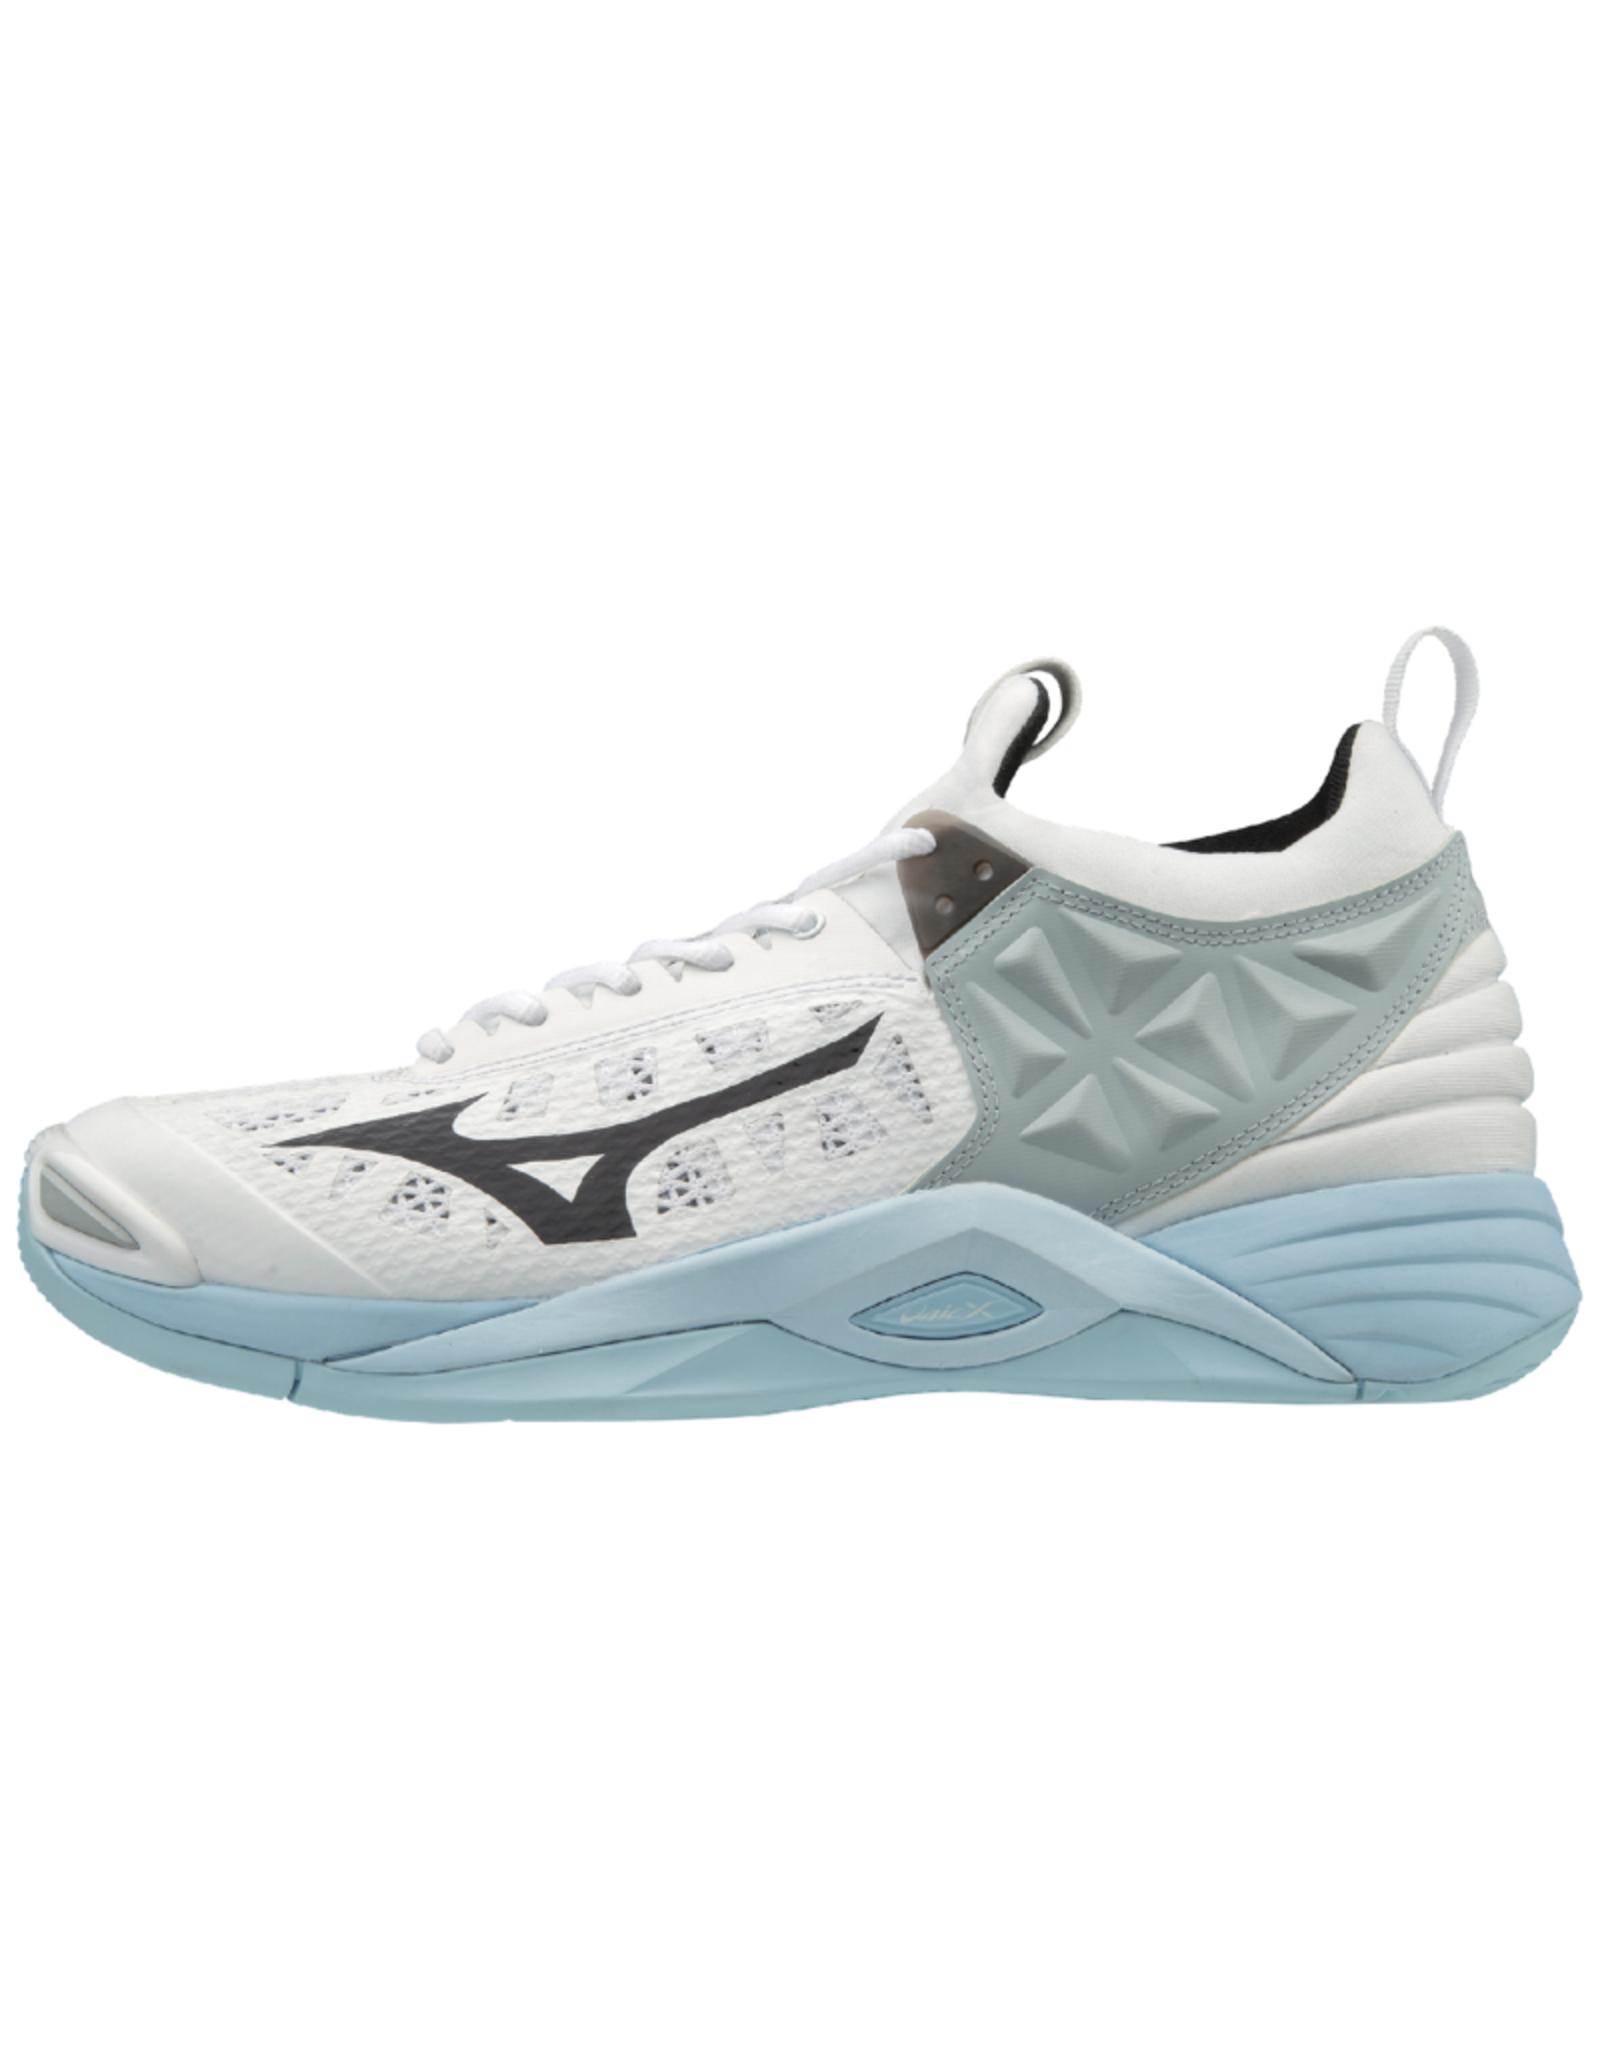 Mizuno Women's Wave Momentum Shoes White/Blue